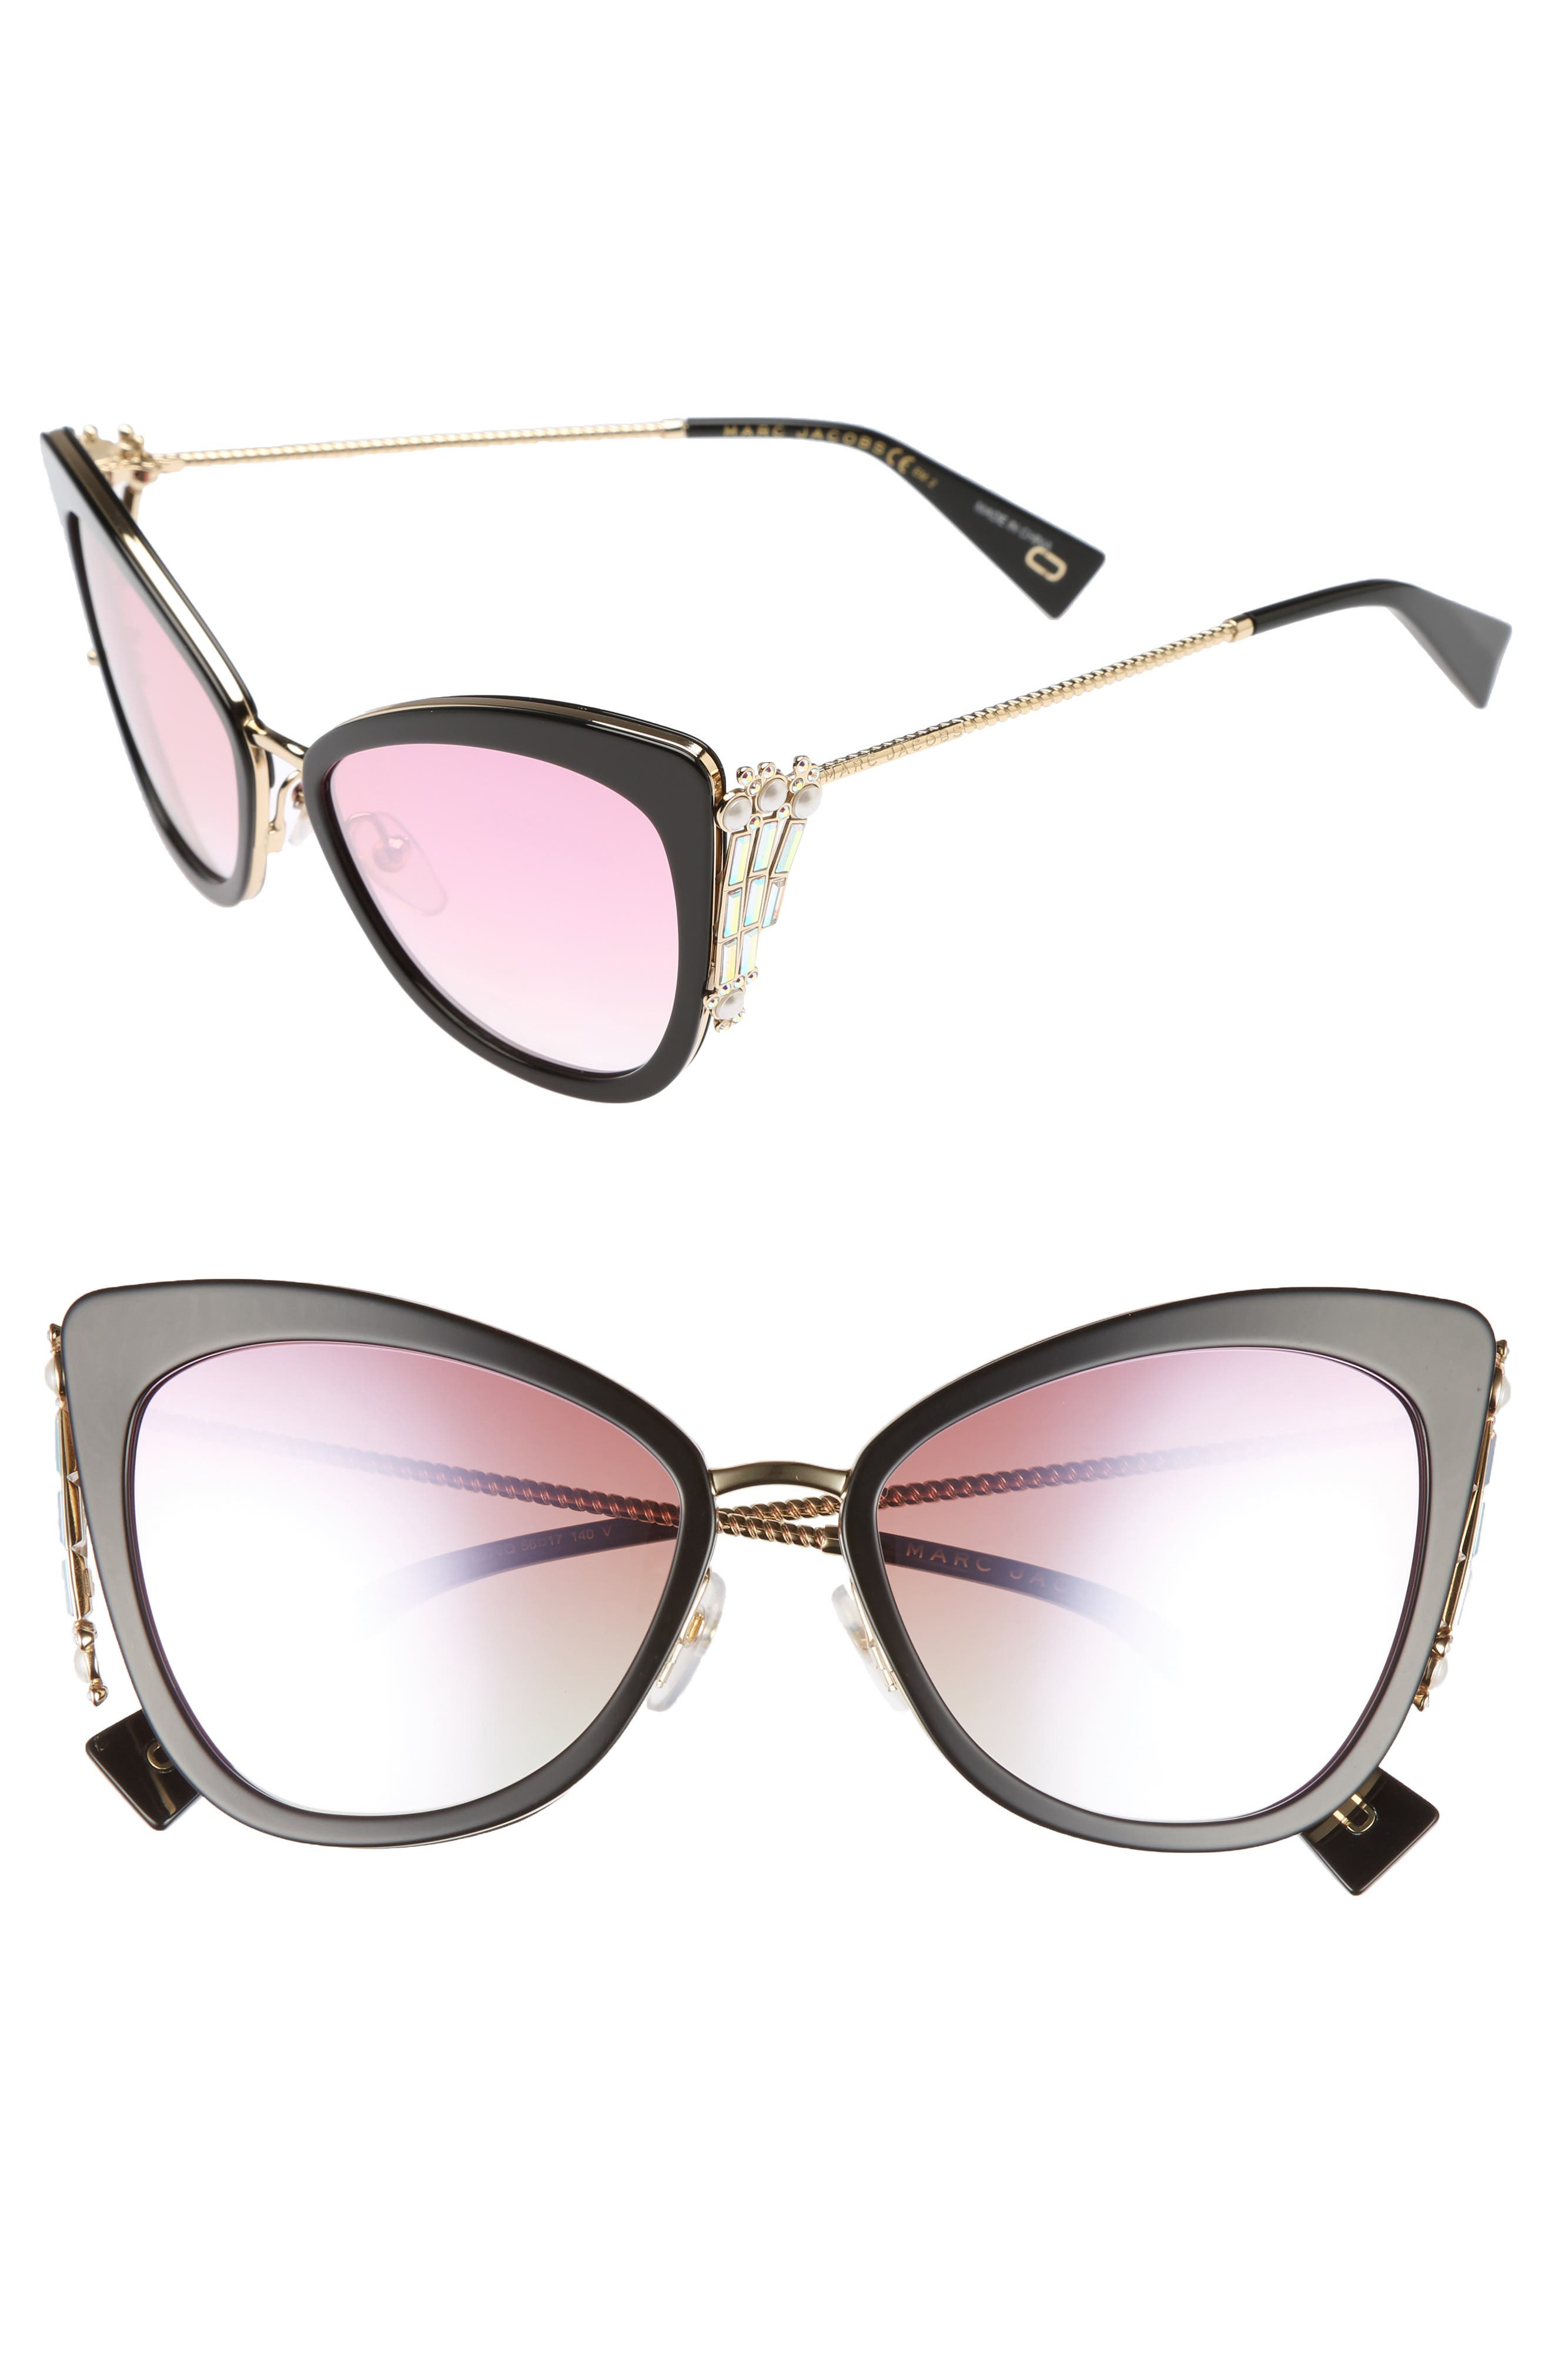 Main Image - MARC JACOBS Embellished 56mm Cat Eye Sunglasses